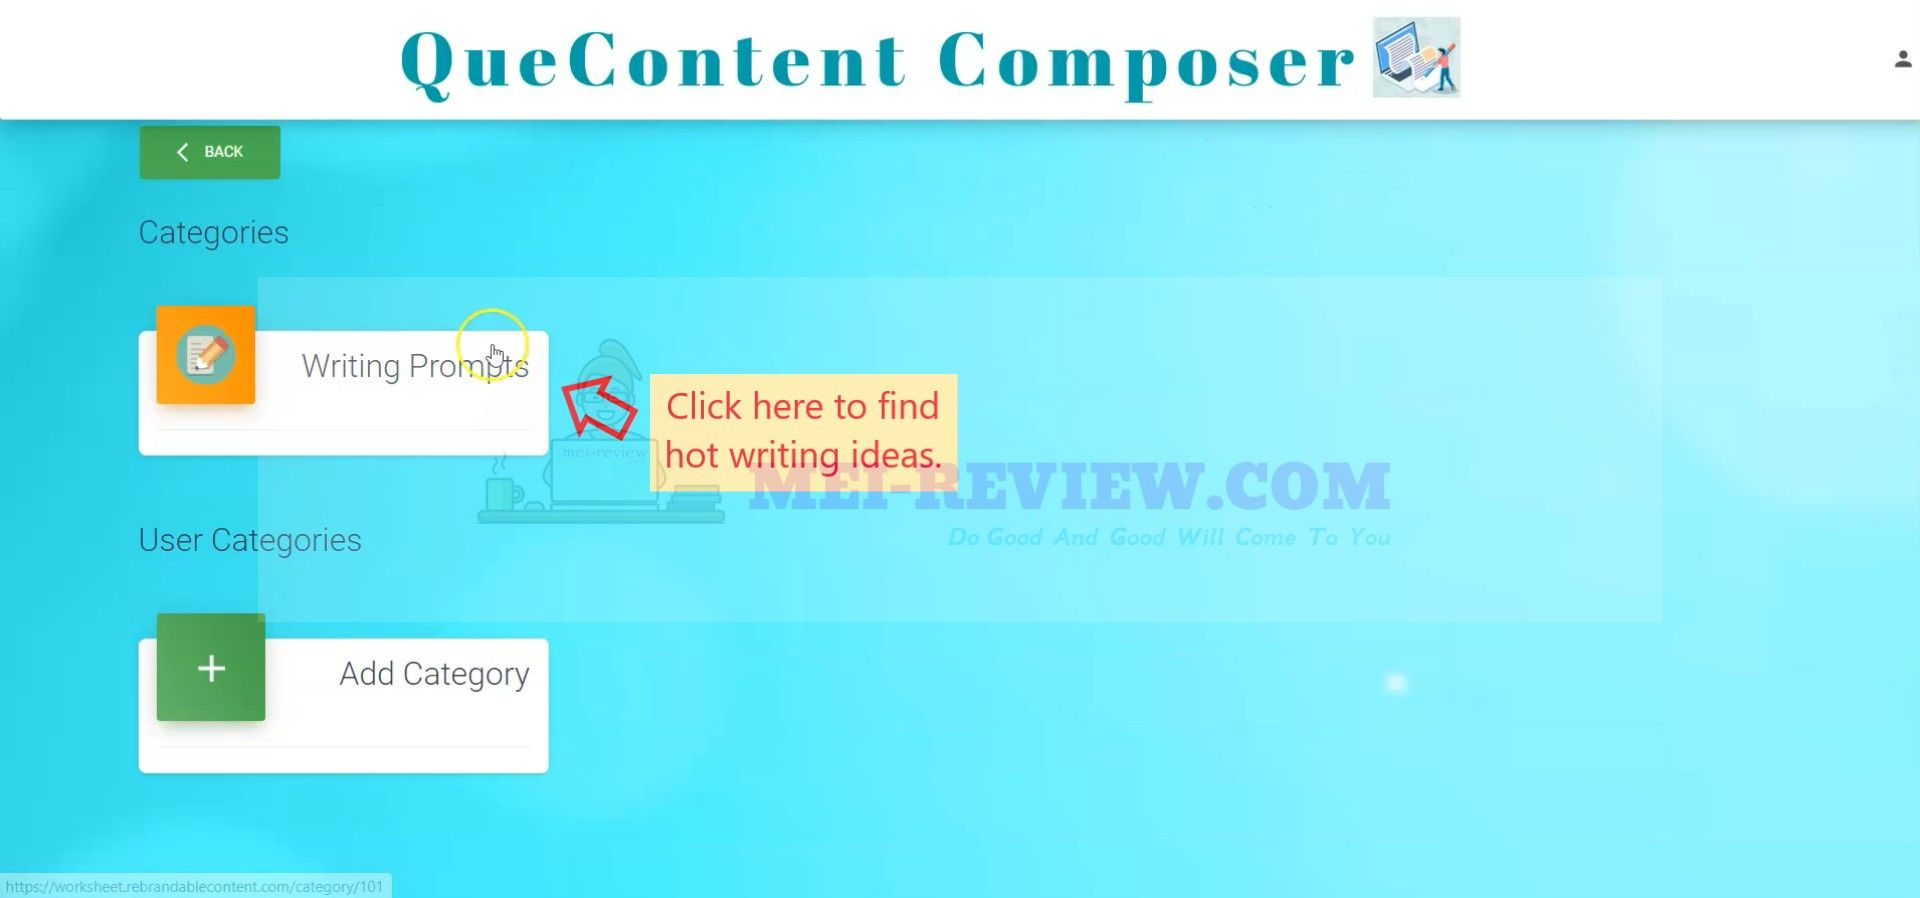 QueContent-Composer-how-to-use-2